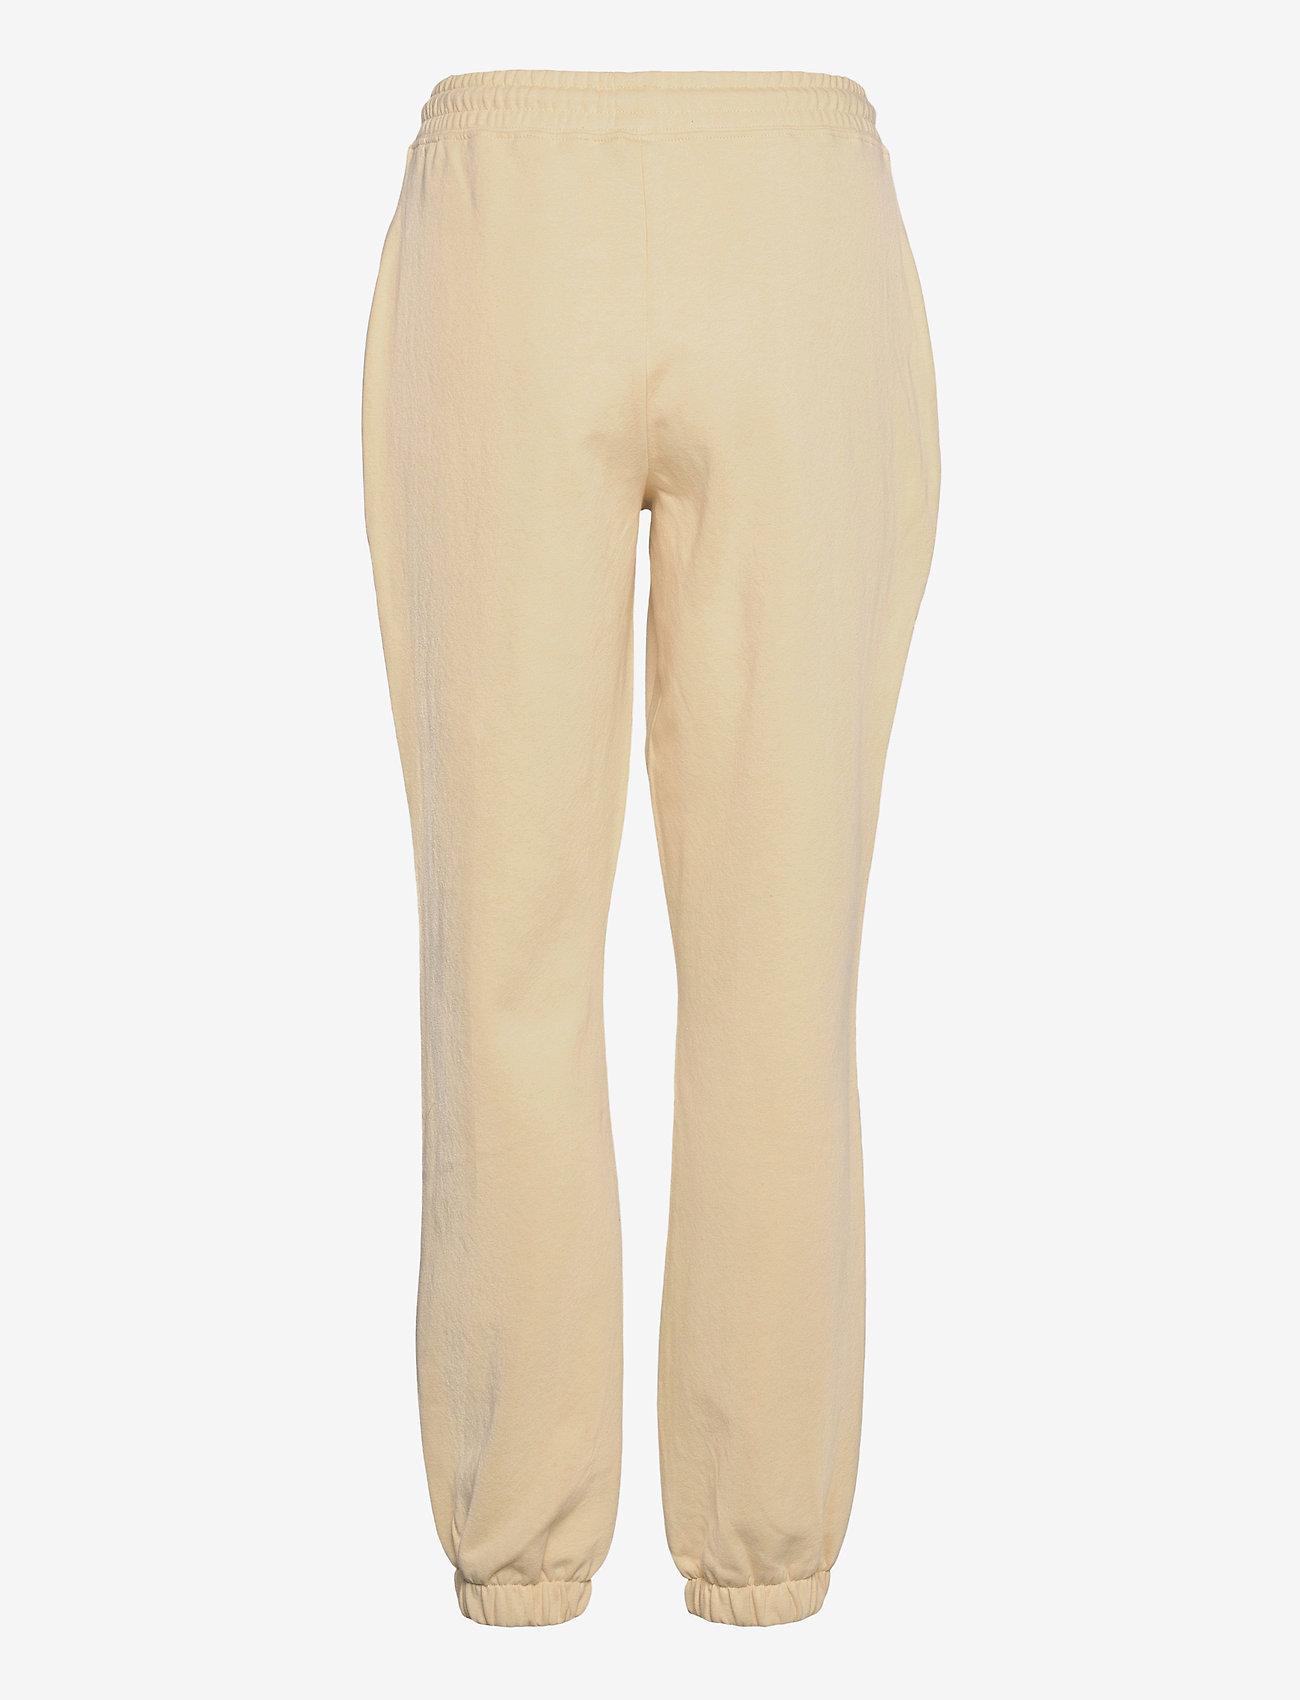 Vero Moda - VMDAISY H/W LOOSE SWEAT PANT EXP - sweatpants - creme brle - 1